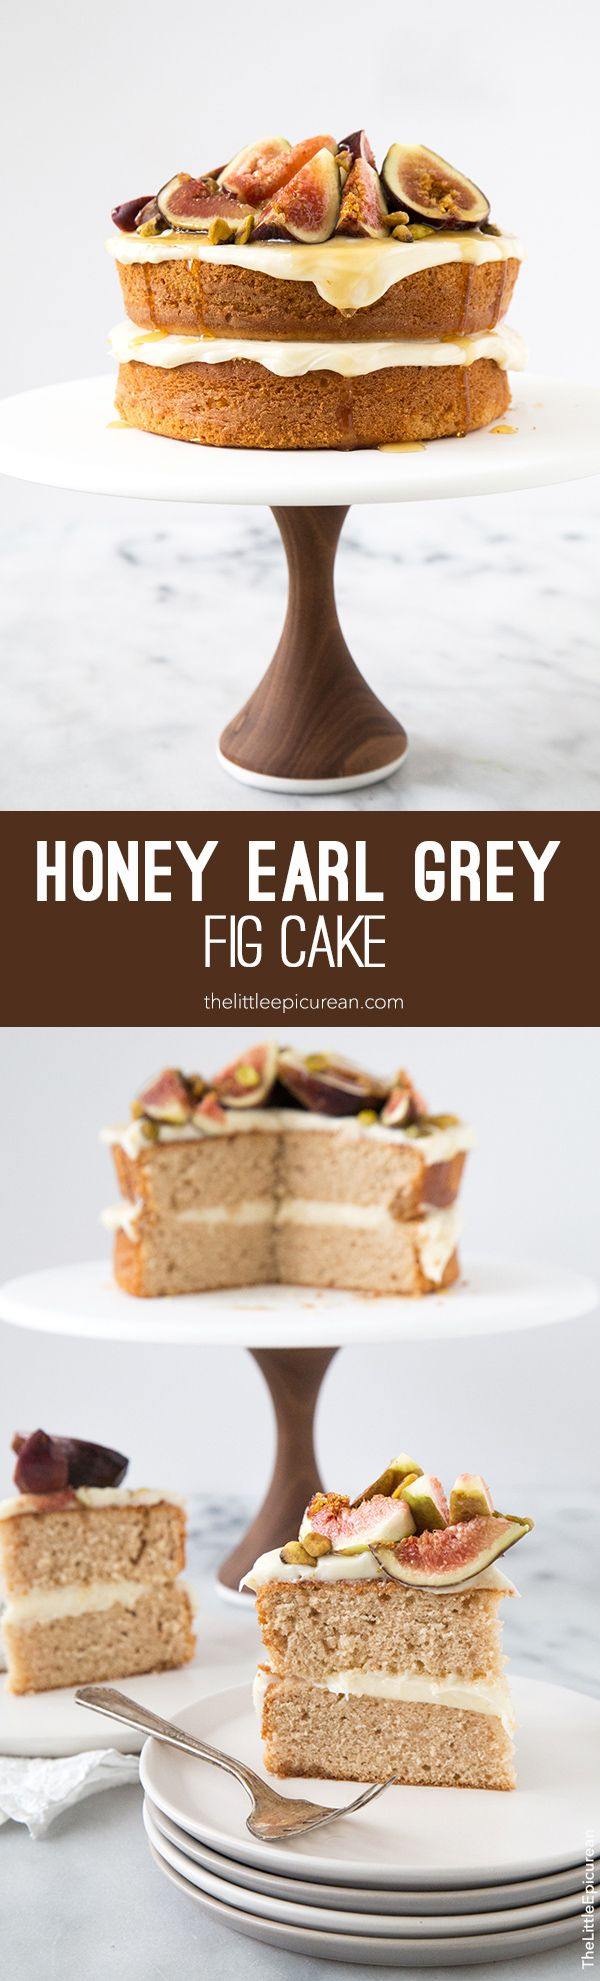 Honey Earl Grey Fig Cake- The Little Epicurean                                                                                                                                                                                 More